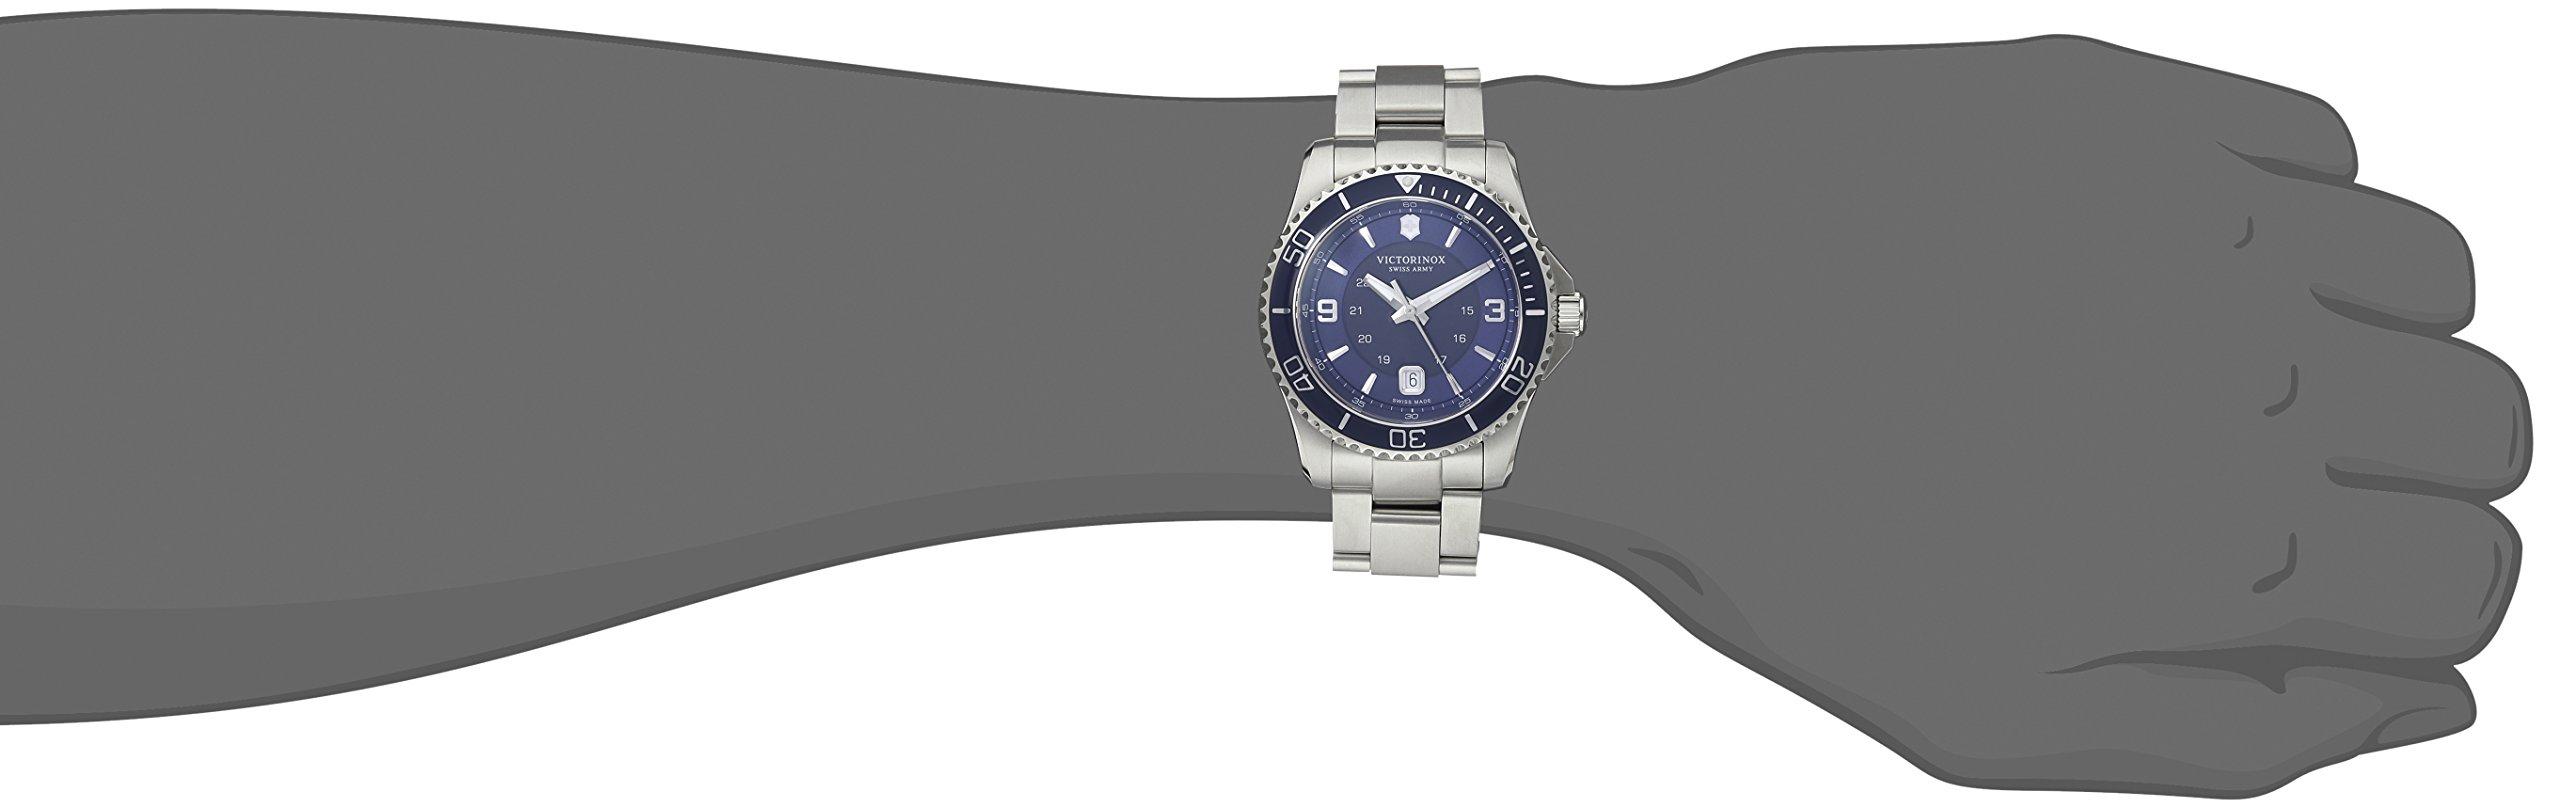 Victorinox Swiss Army Maverick Stainless Steel Watch, 43mm, Black by Victorinox Swiss Army (Image #2)